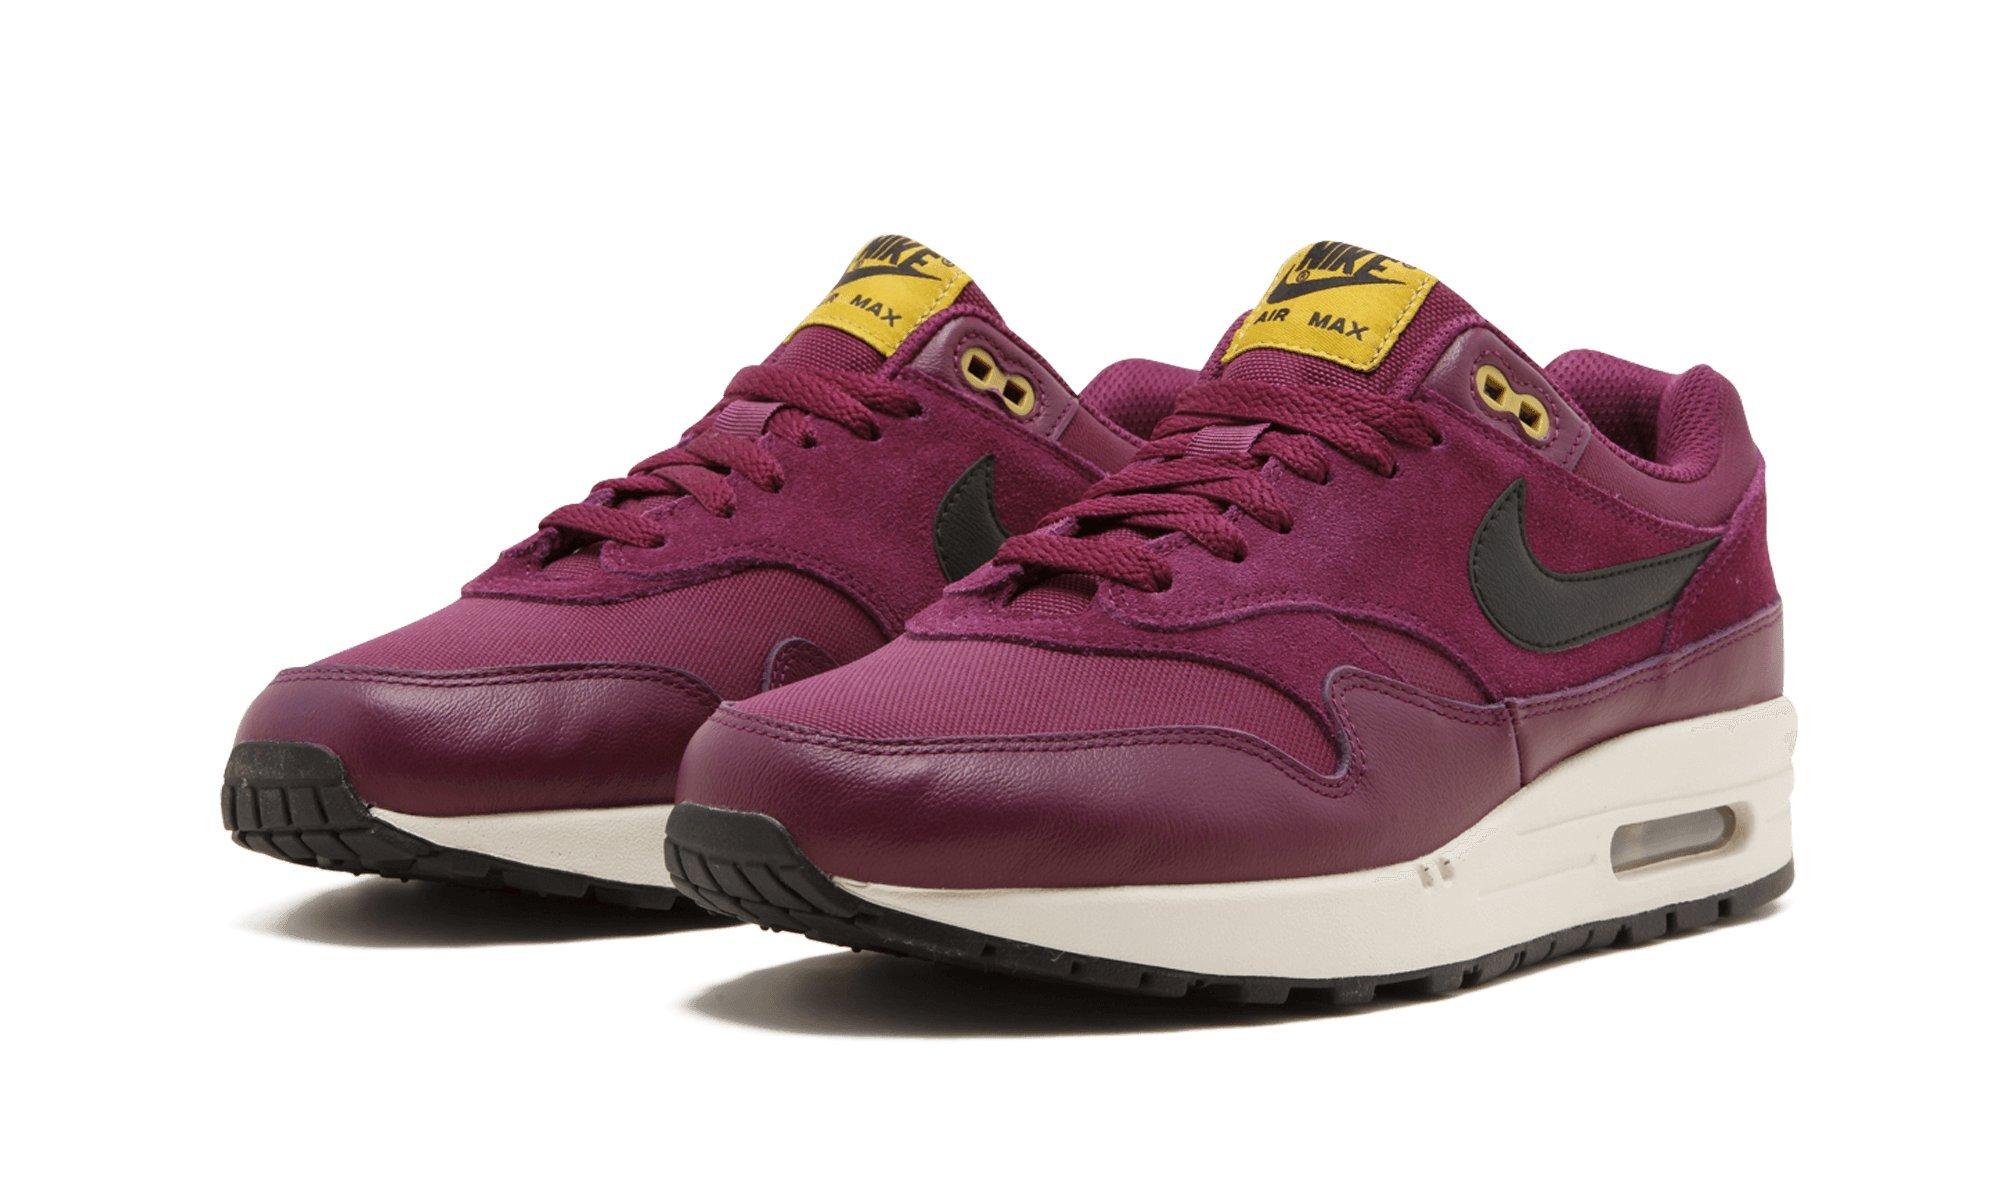 Galleon Nike Air Max 1 Premium Men's Shoes BordeauxDesert